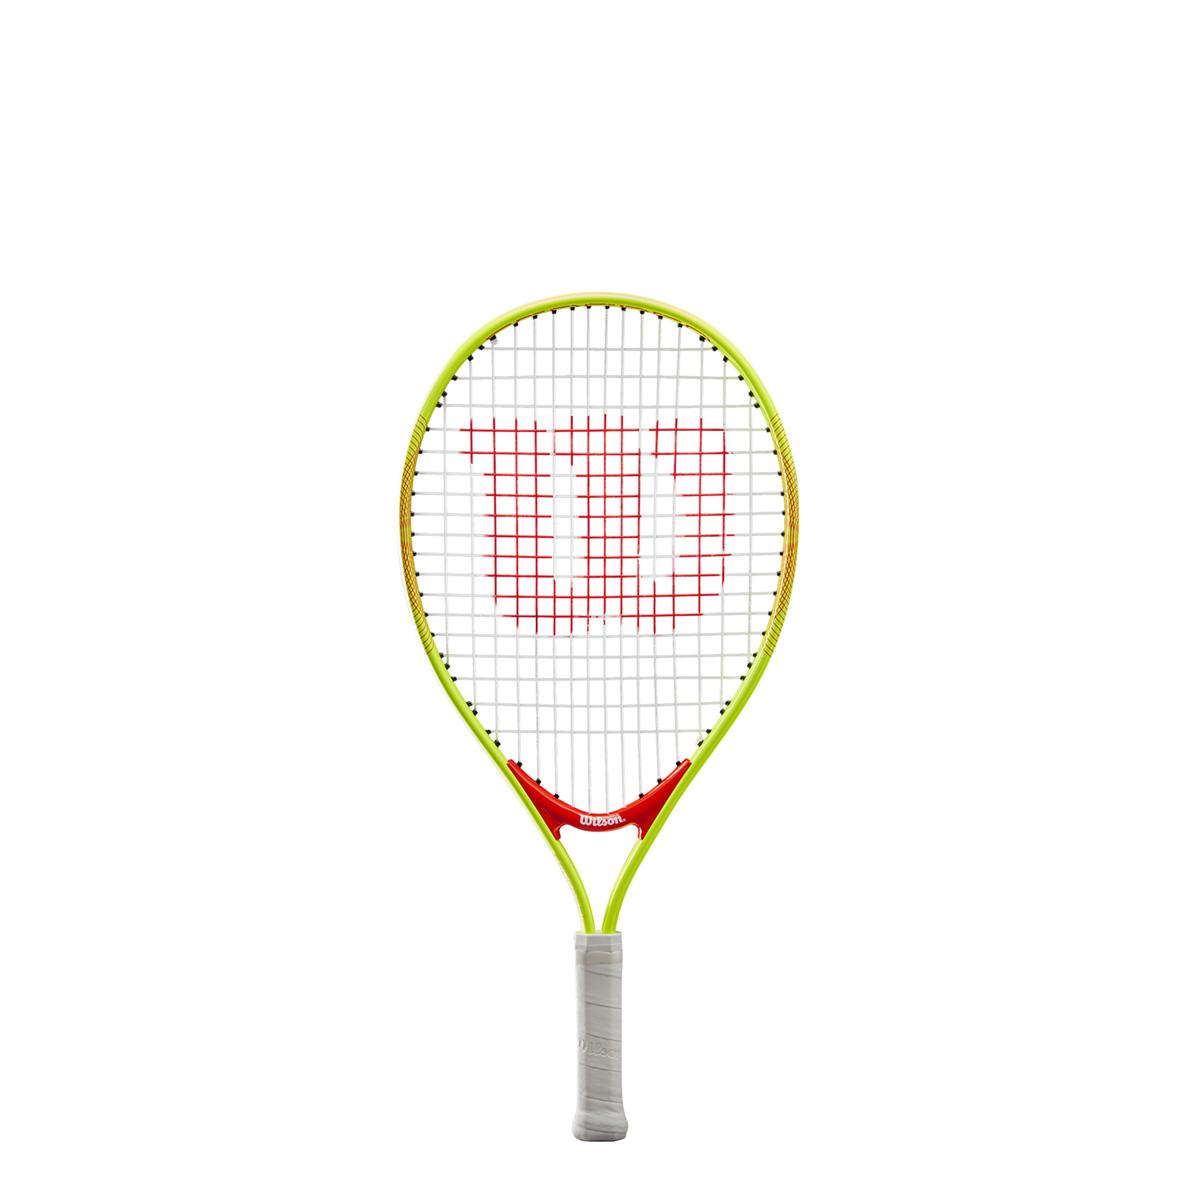 WR029410U_0_Federer_21_NeonYellow_RD